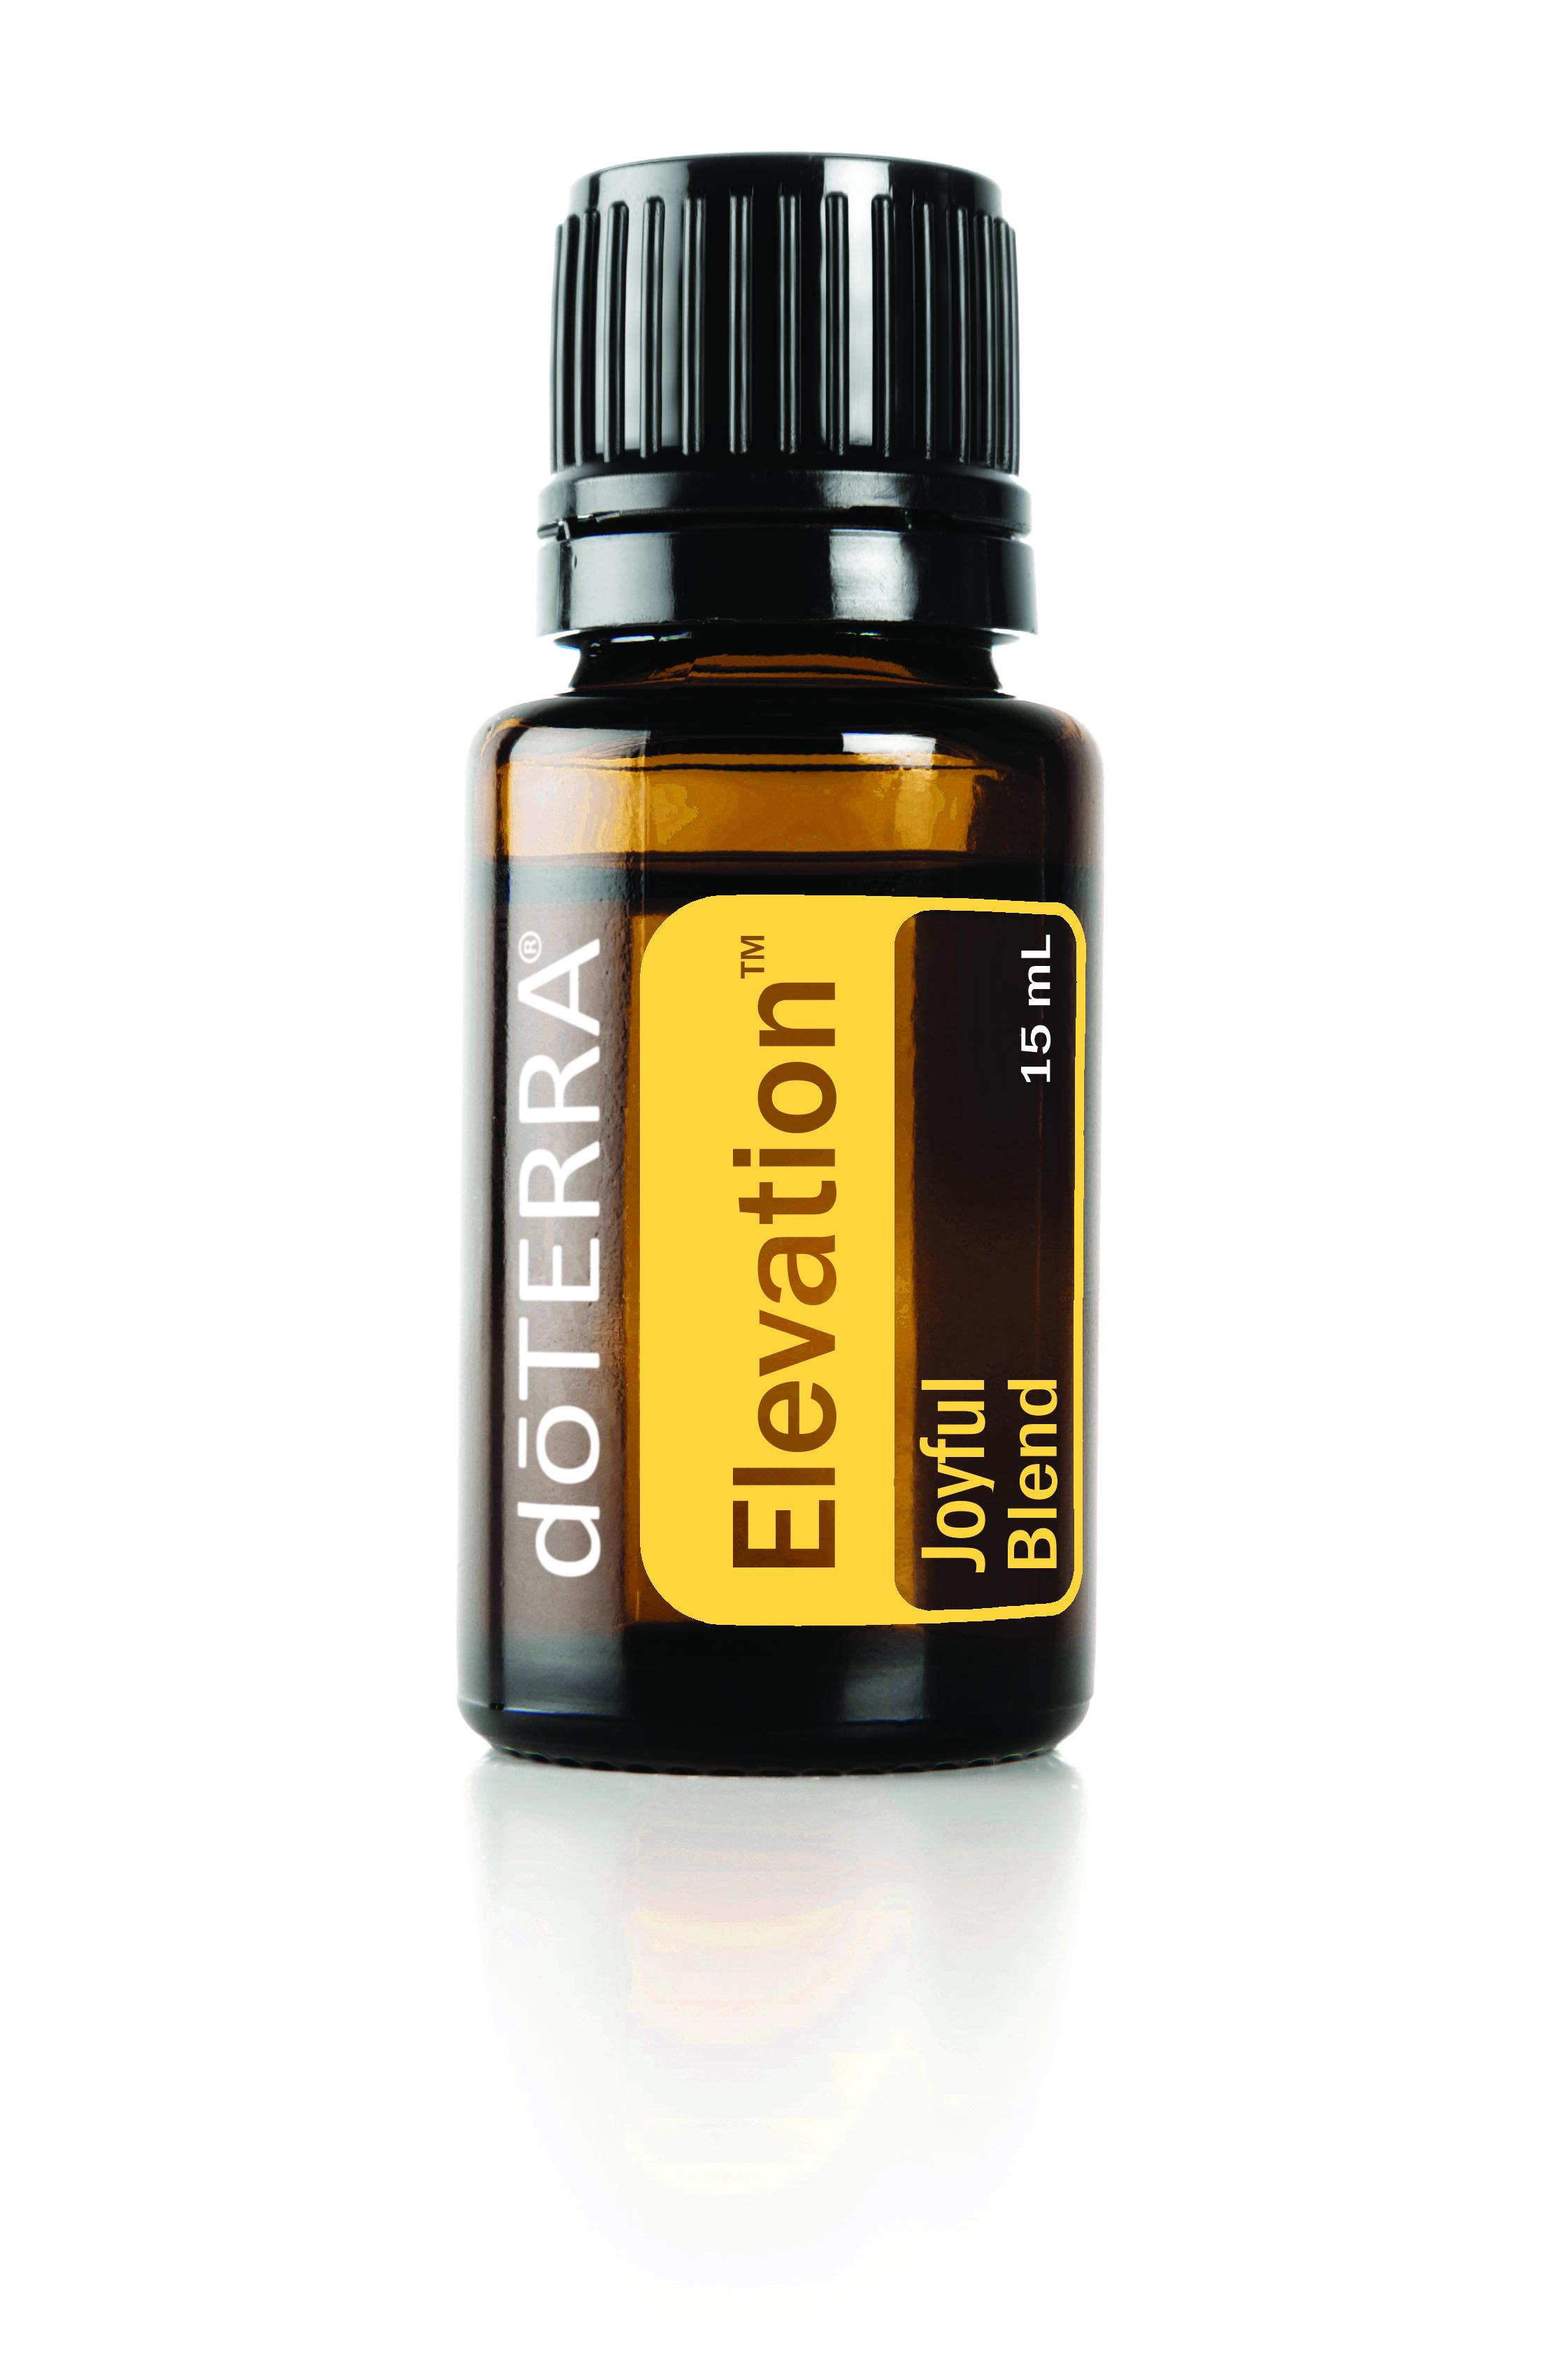 Elevation Joyful Essential Oils Blend